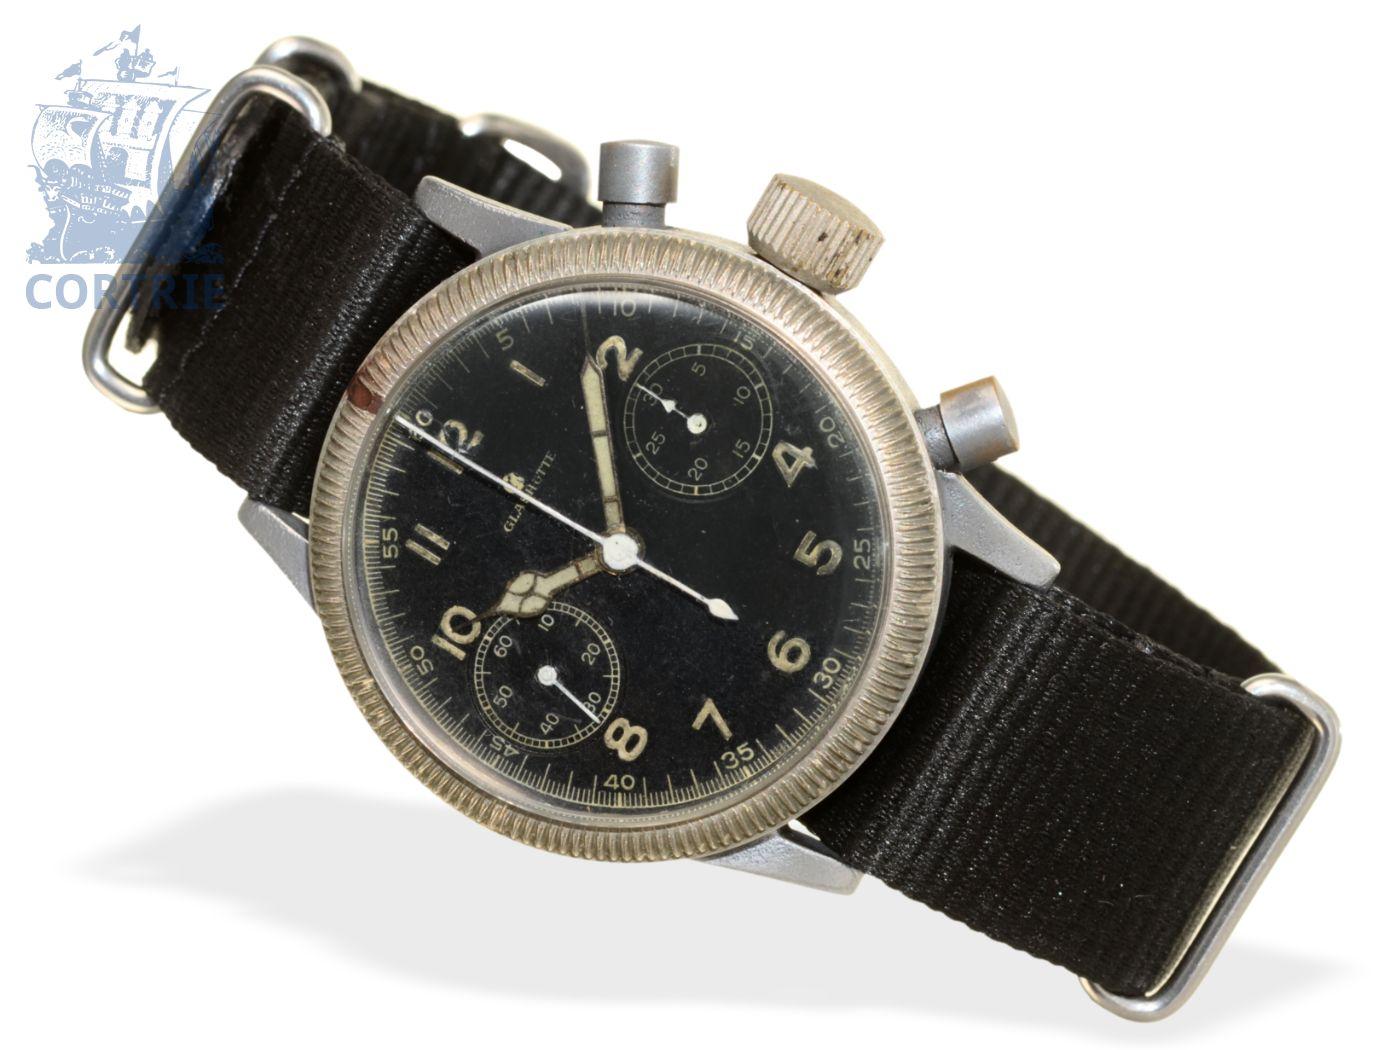 Wristwatch: rare pilot's chronograph from the 40s, Tutima Glashütte-